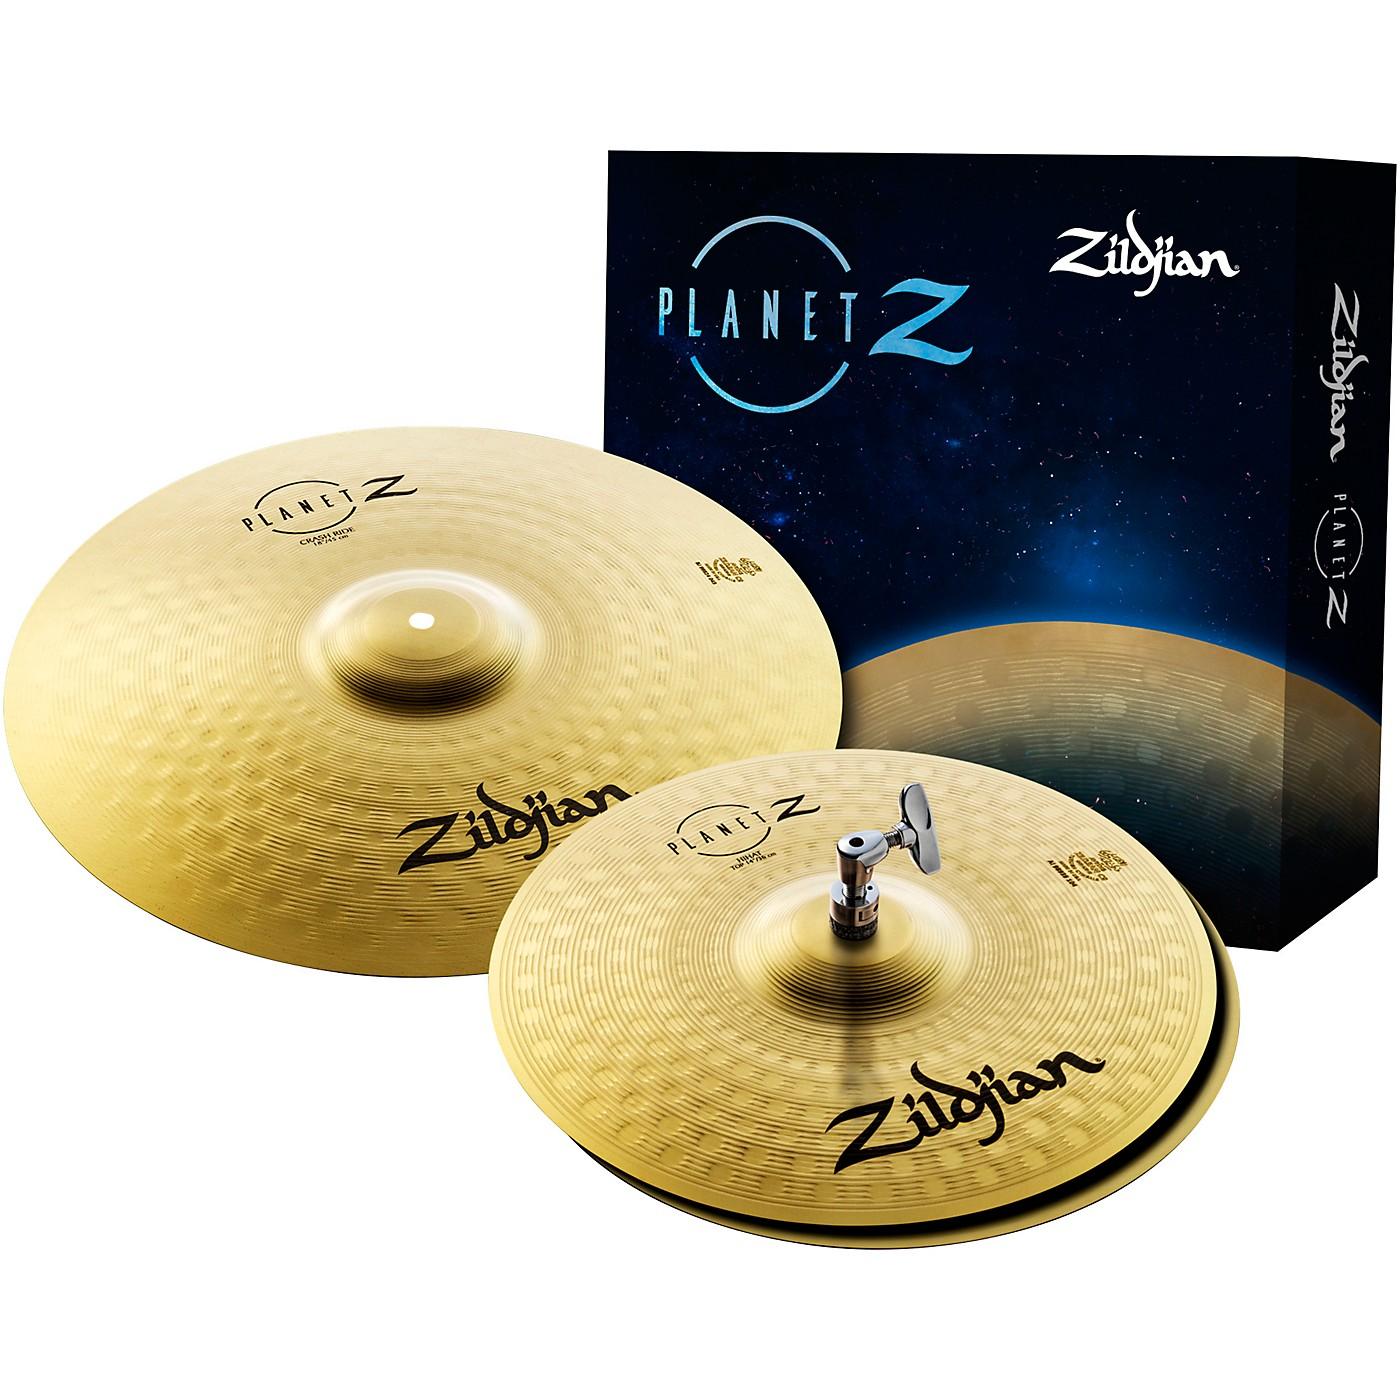 Zildjian Planet Z Fundamentals Cymbal Set thumbnail